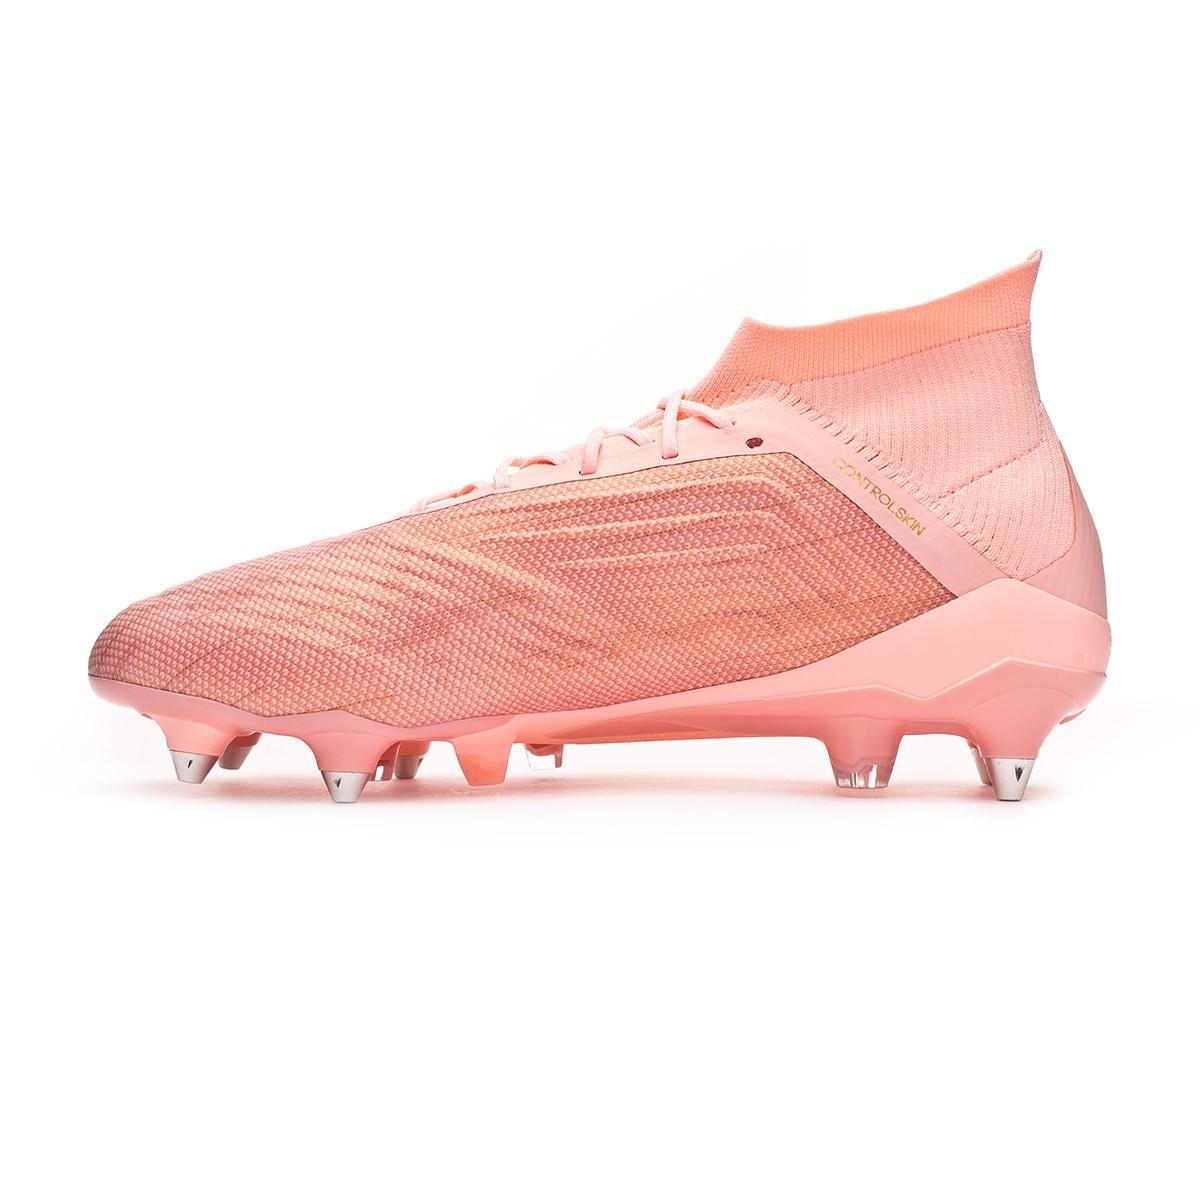 454dabf4924 Football Boots adidas Predator 18.1 SG Clear orange-Trace pink - Football  store Fútbol Emotion